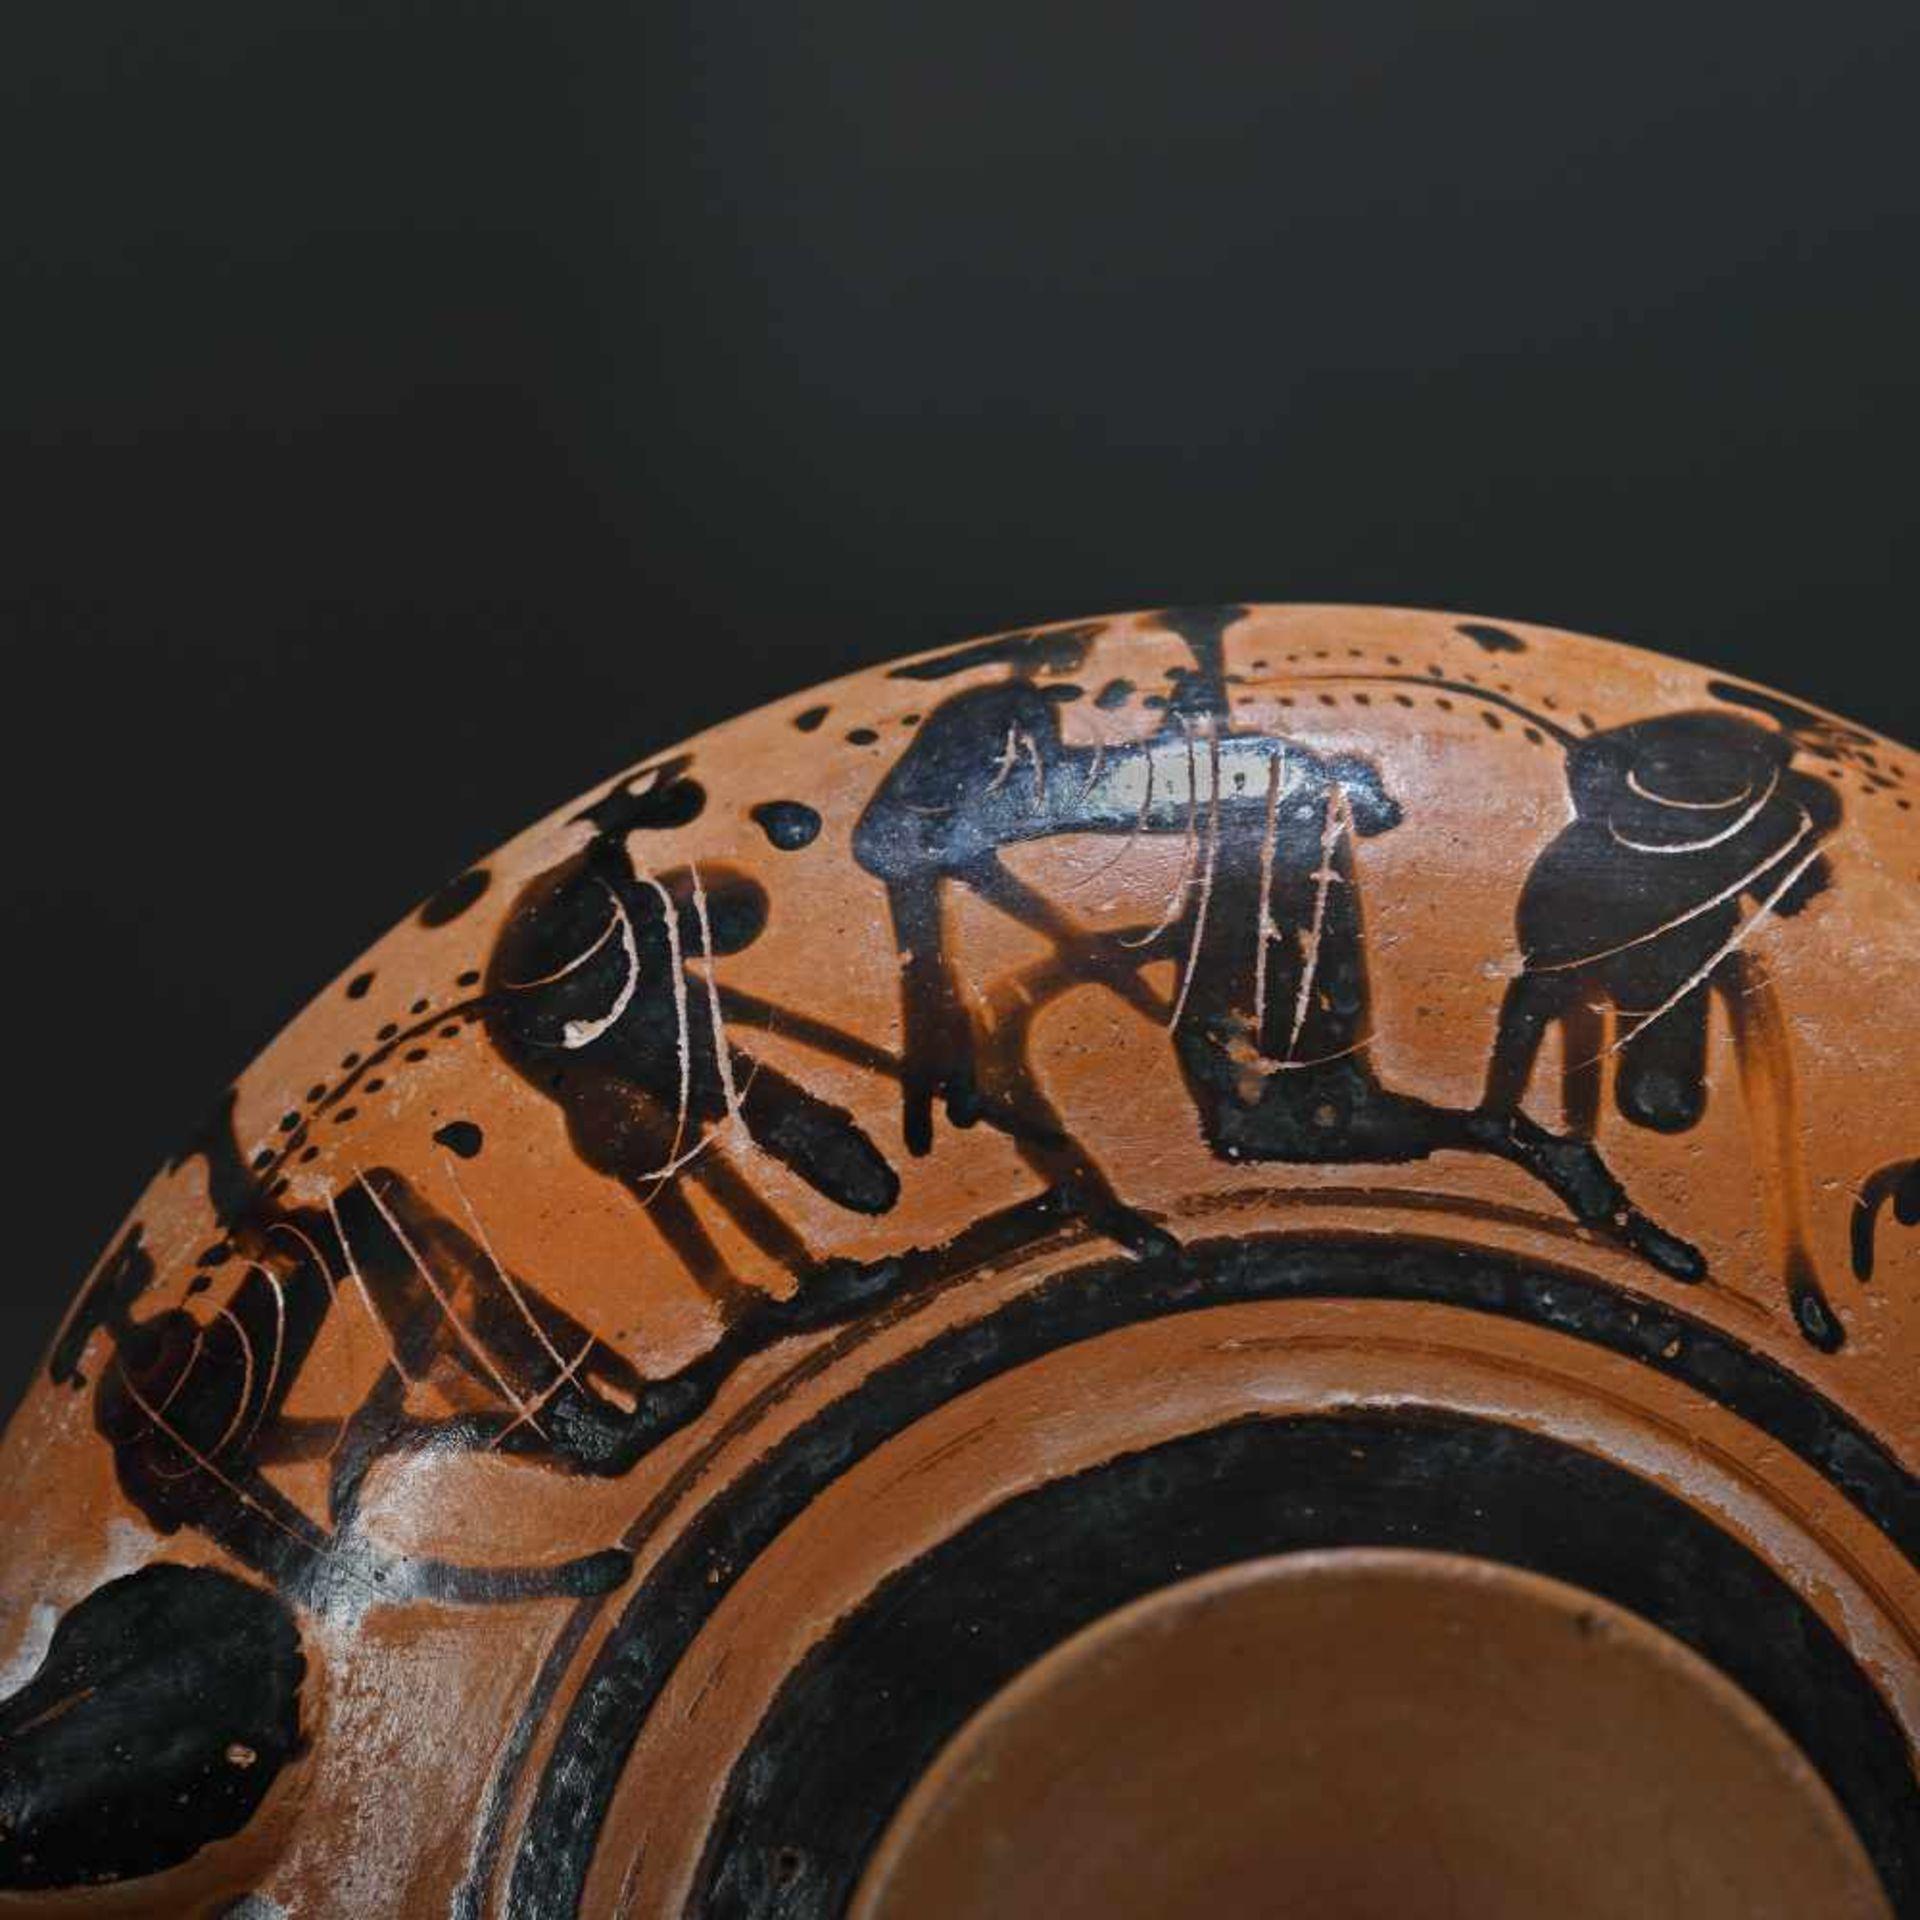 Kylix - ceramic wine jug, black-figure style, Classical Greece, approx. 2,400 years old, 4th century - Bild 3 aus 7